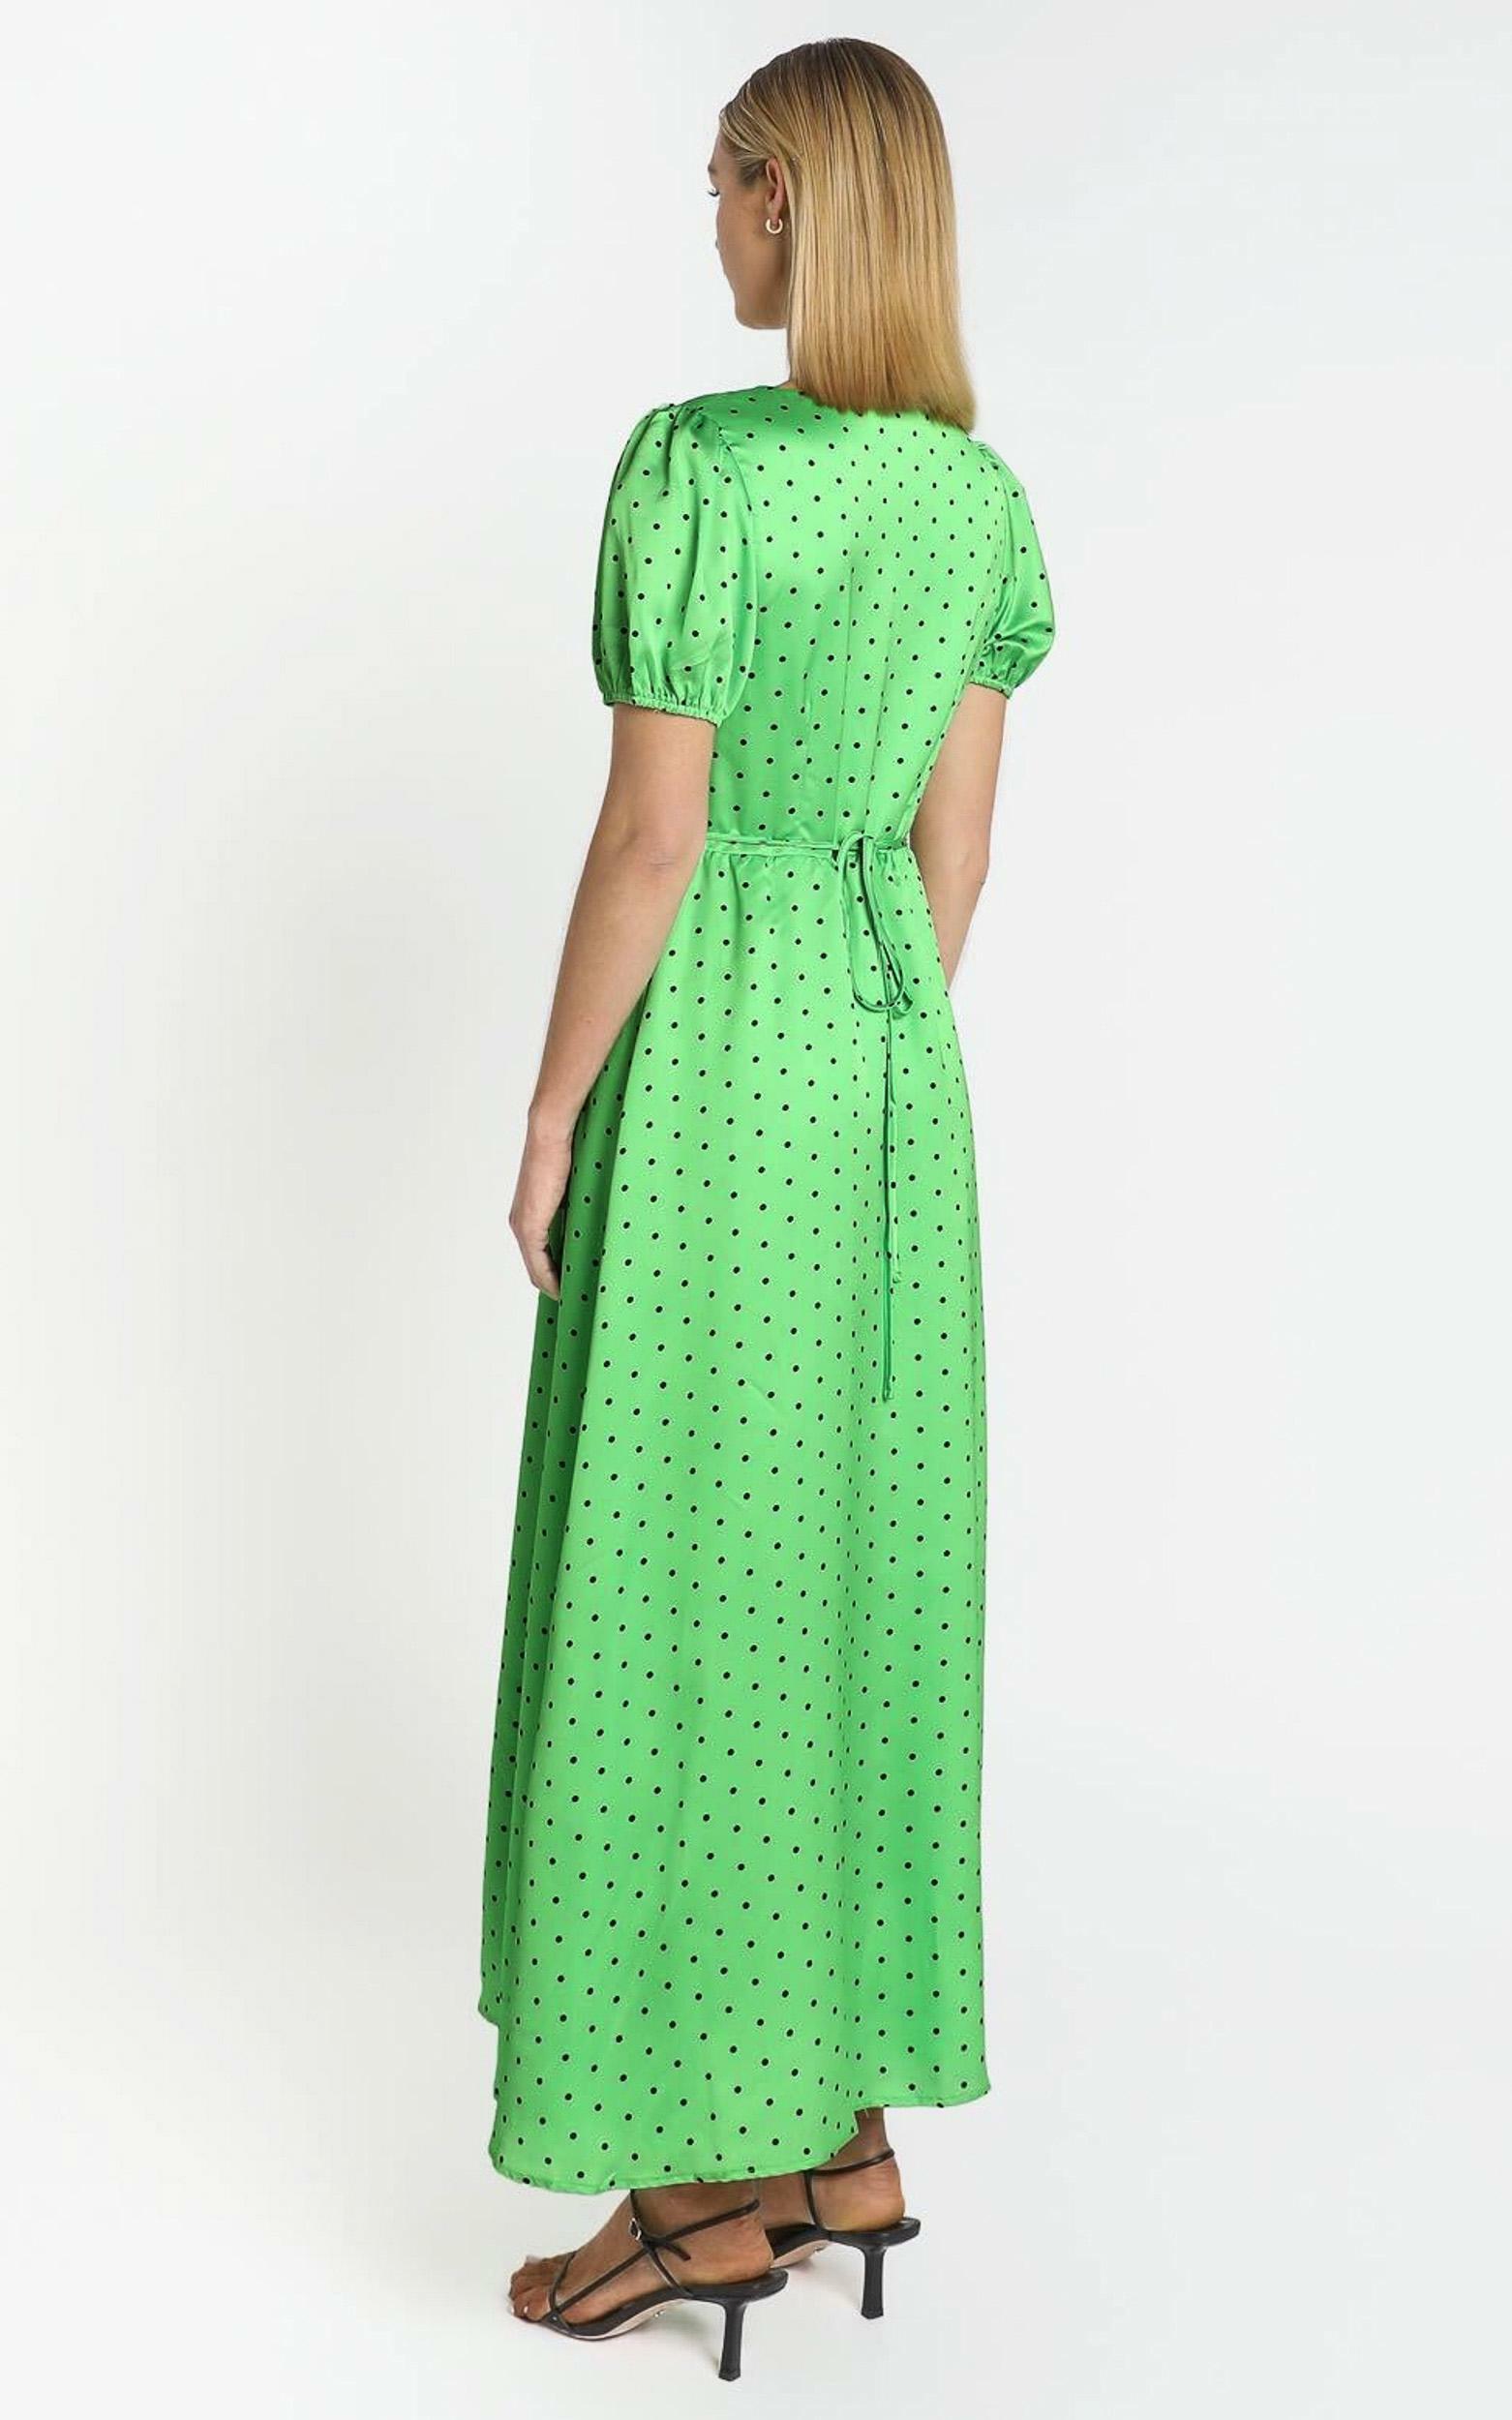 Kori Midi Dress in green polka - 6 (XS), GRN1, hi-res image number null